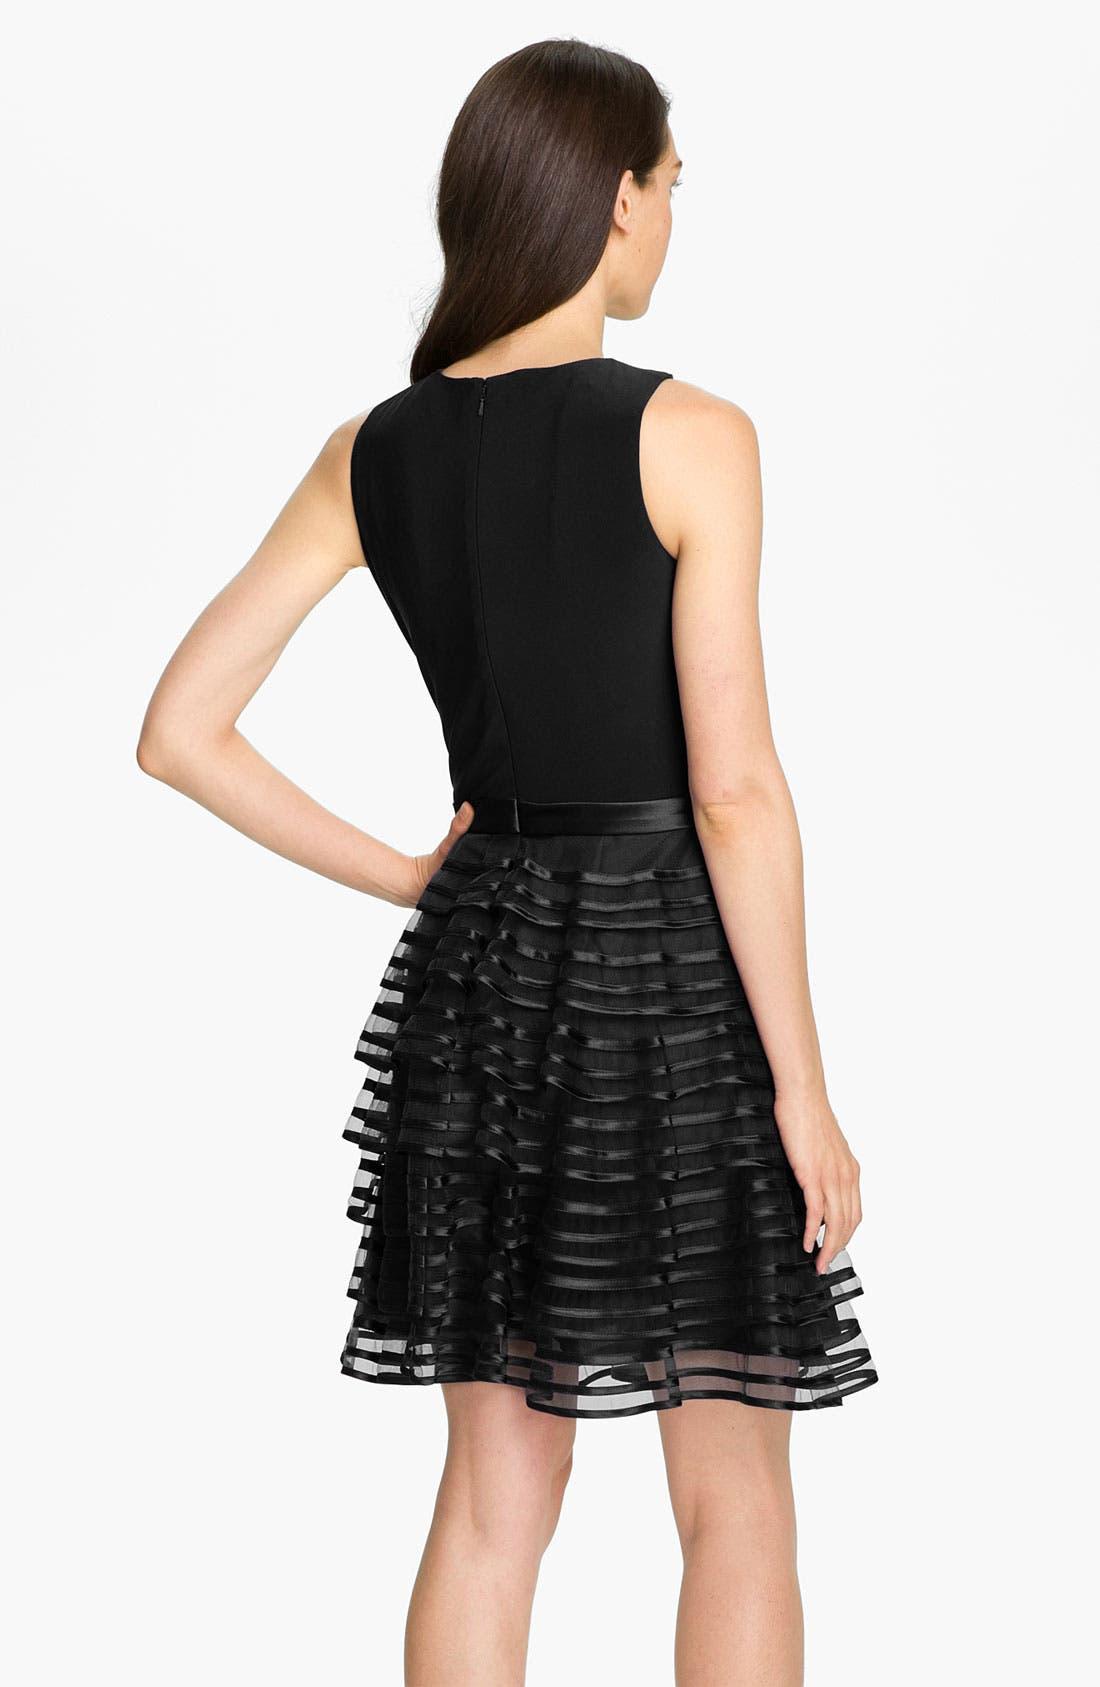 Alternate Image 2  - Kathy Hilton Tiered Skirt Mixed Media Dress